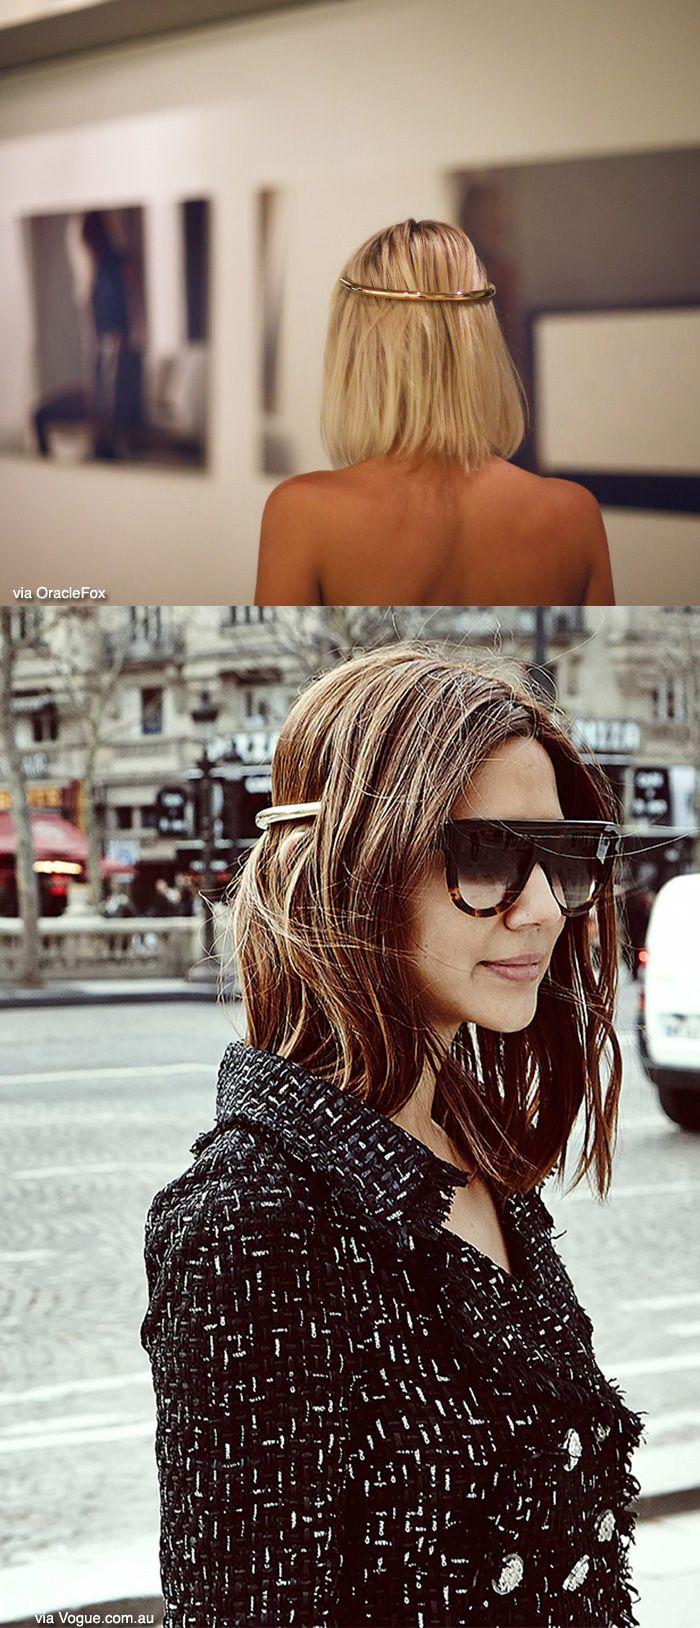 bd27496cf61e Blue is in Fashion this Year Christine Centenera, Fashion Editor, Fashion  Trends, Womens